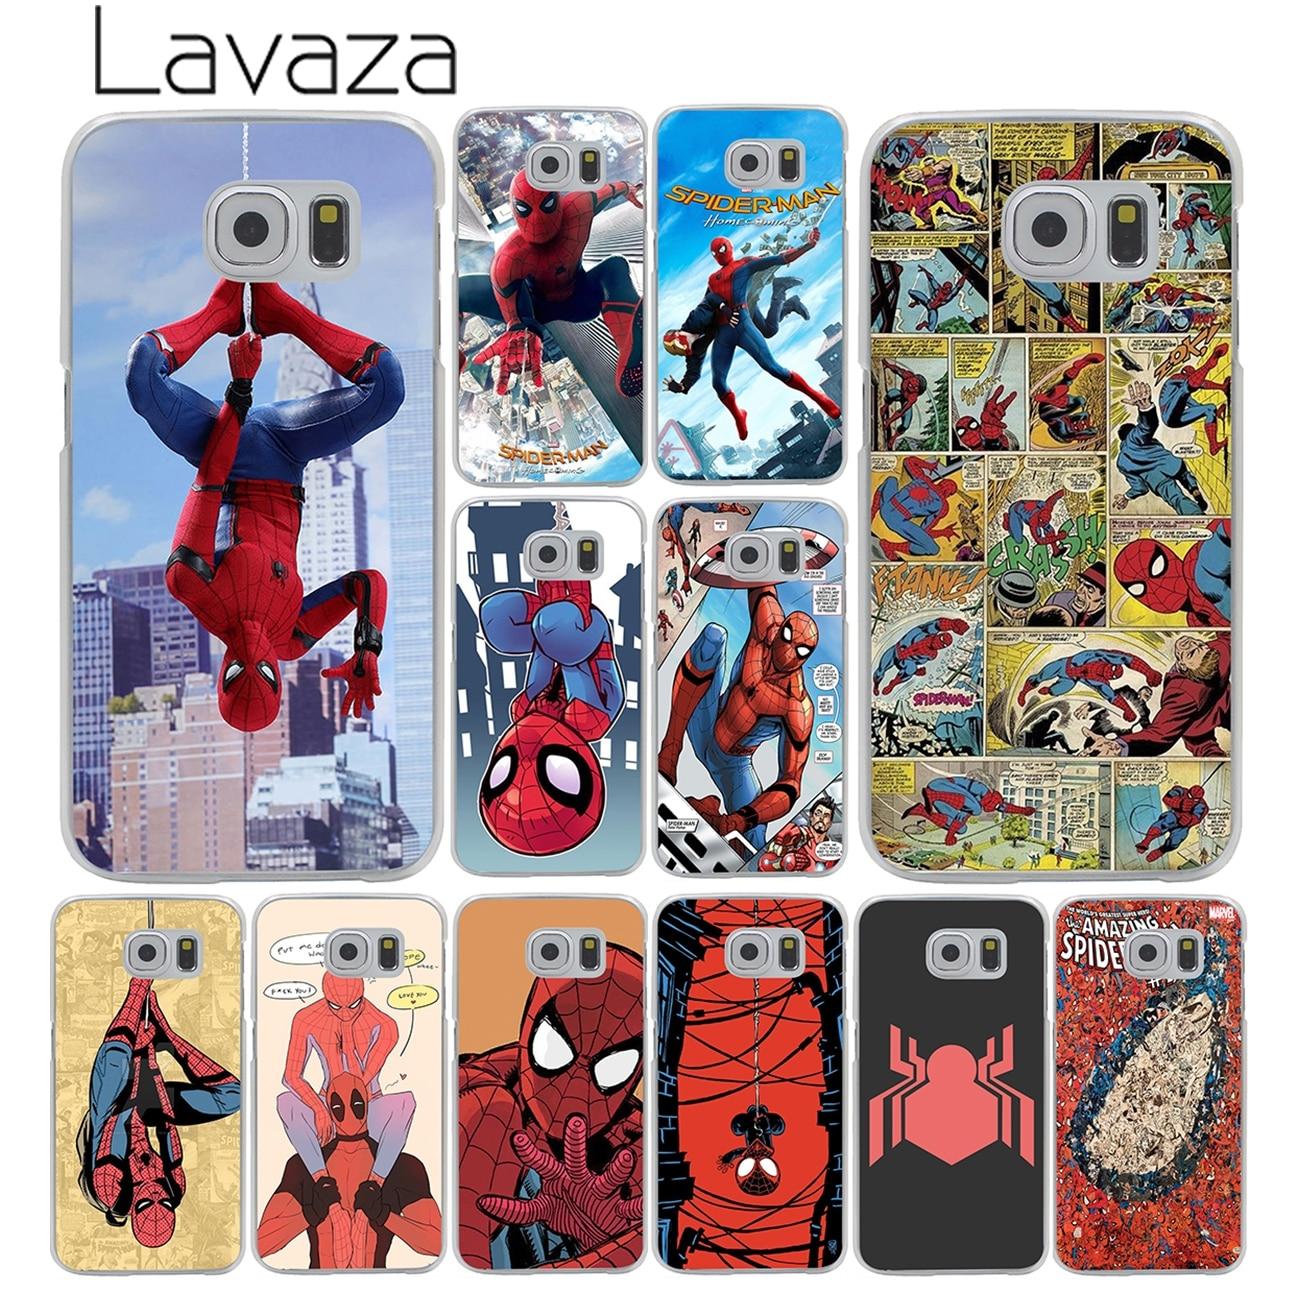 Lavaza <font><b>Spider</b></font>-<font><b>Man</b></font> Marvel <font><b>Spider</b></font> <font><b>Man</b></font> Homecoming <font><b>Comics</b></font> Hard for <font><b>Samsung</b></font> <font><b>Galaxy</b></font> S6 S7 S8 Edge Plus S5 S4 S3 & <font><b>Mini</b></font> Case